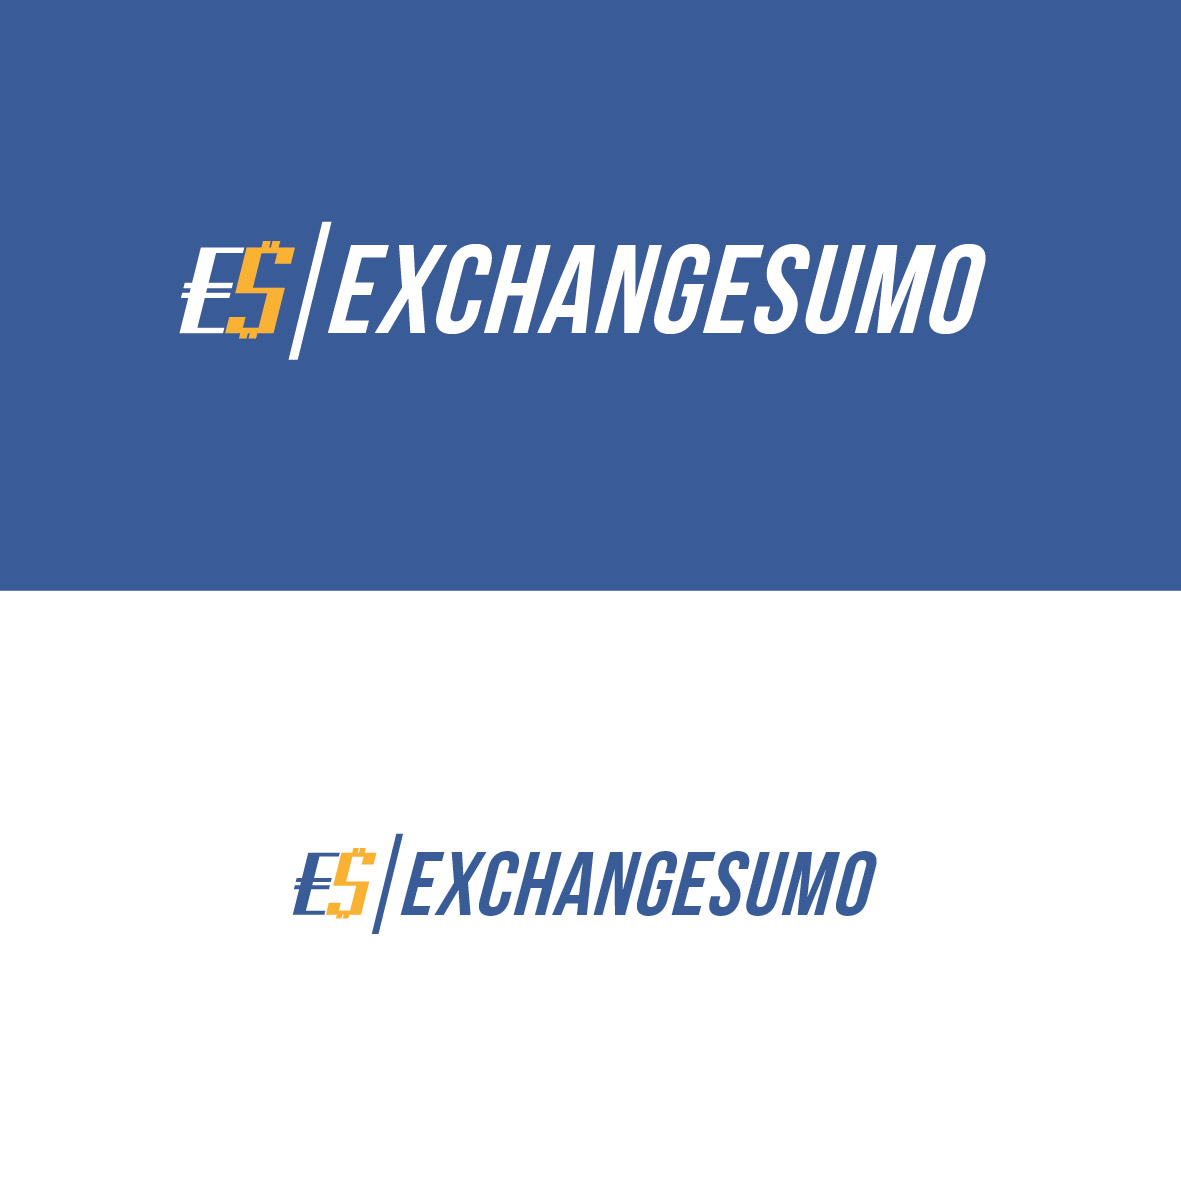 Логотип для мониторинга обменников фото f_5665bae6254c3cca.jpg